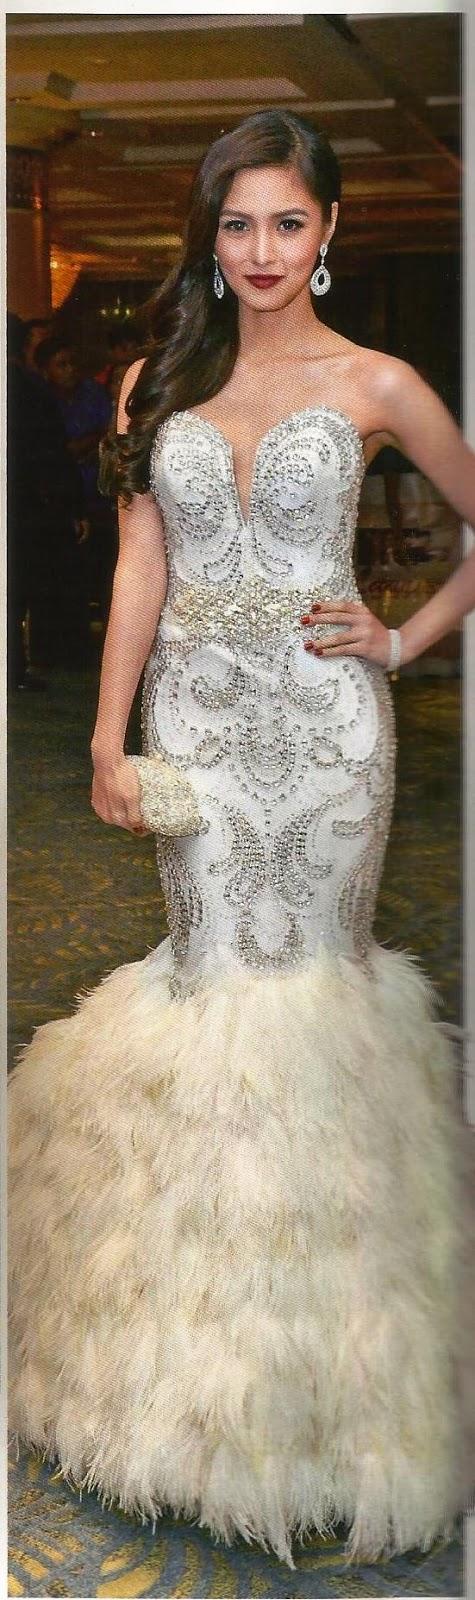 Modern Roxanne Guinoo Wedding Gown Illustration - Images for wedding ...